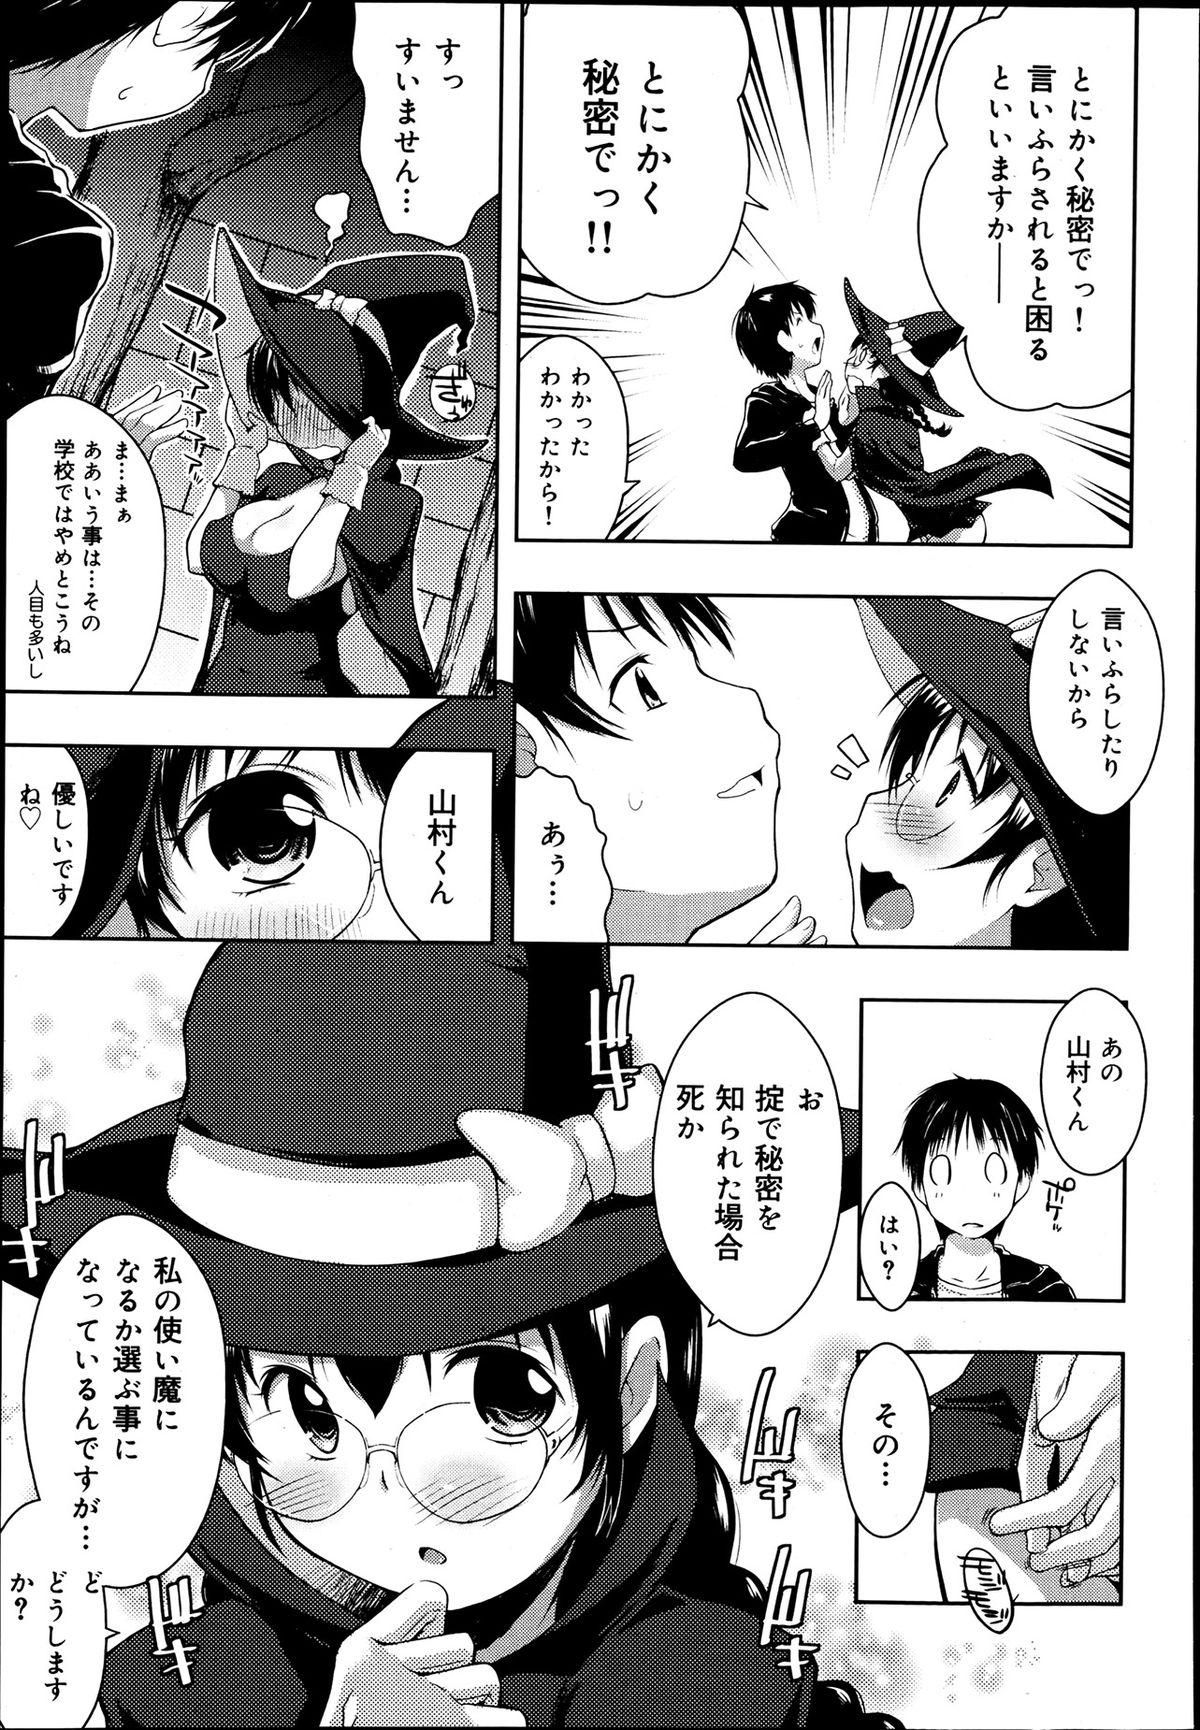 COMIC Maihime Musou Act. 06 2013-07 134